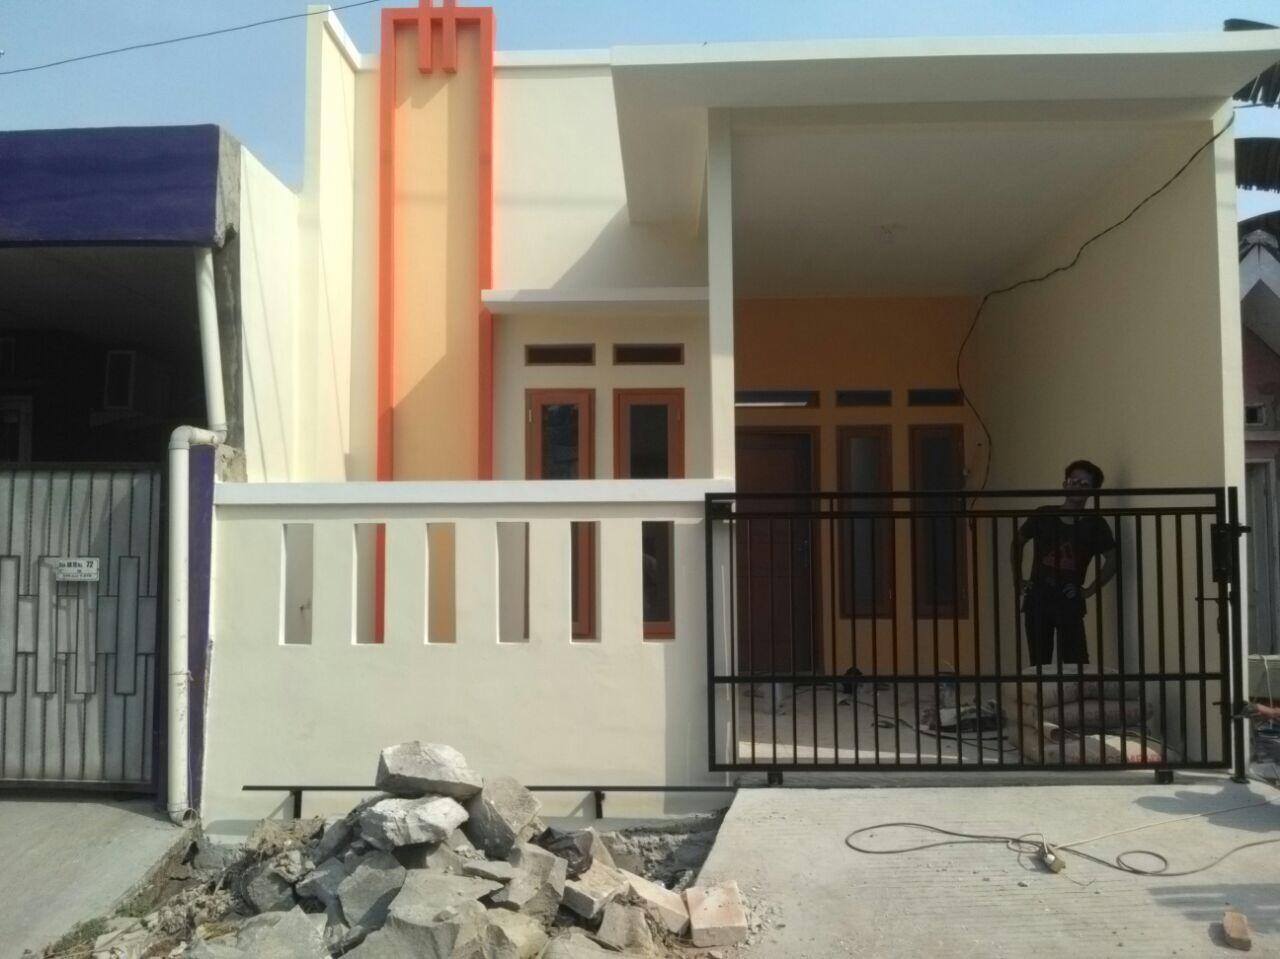 rumah baru renovasi siap huni 1 lantai cantik di vila gading harapan blok an10 babelan  bekasi jawa barat